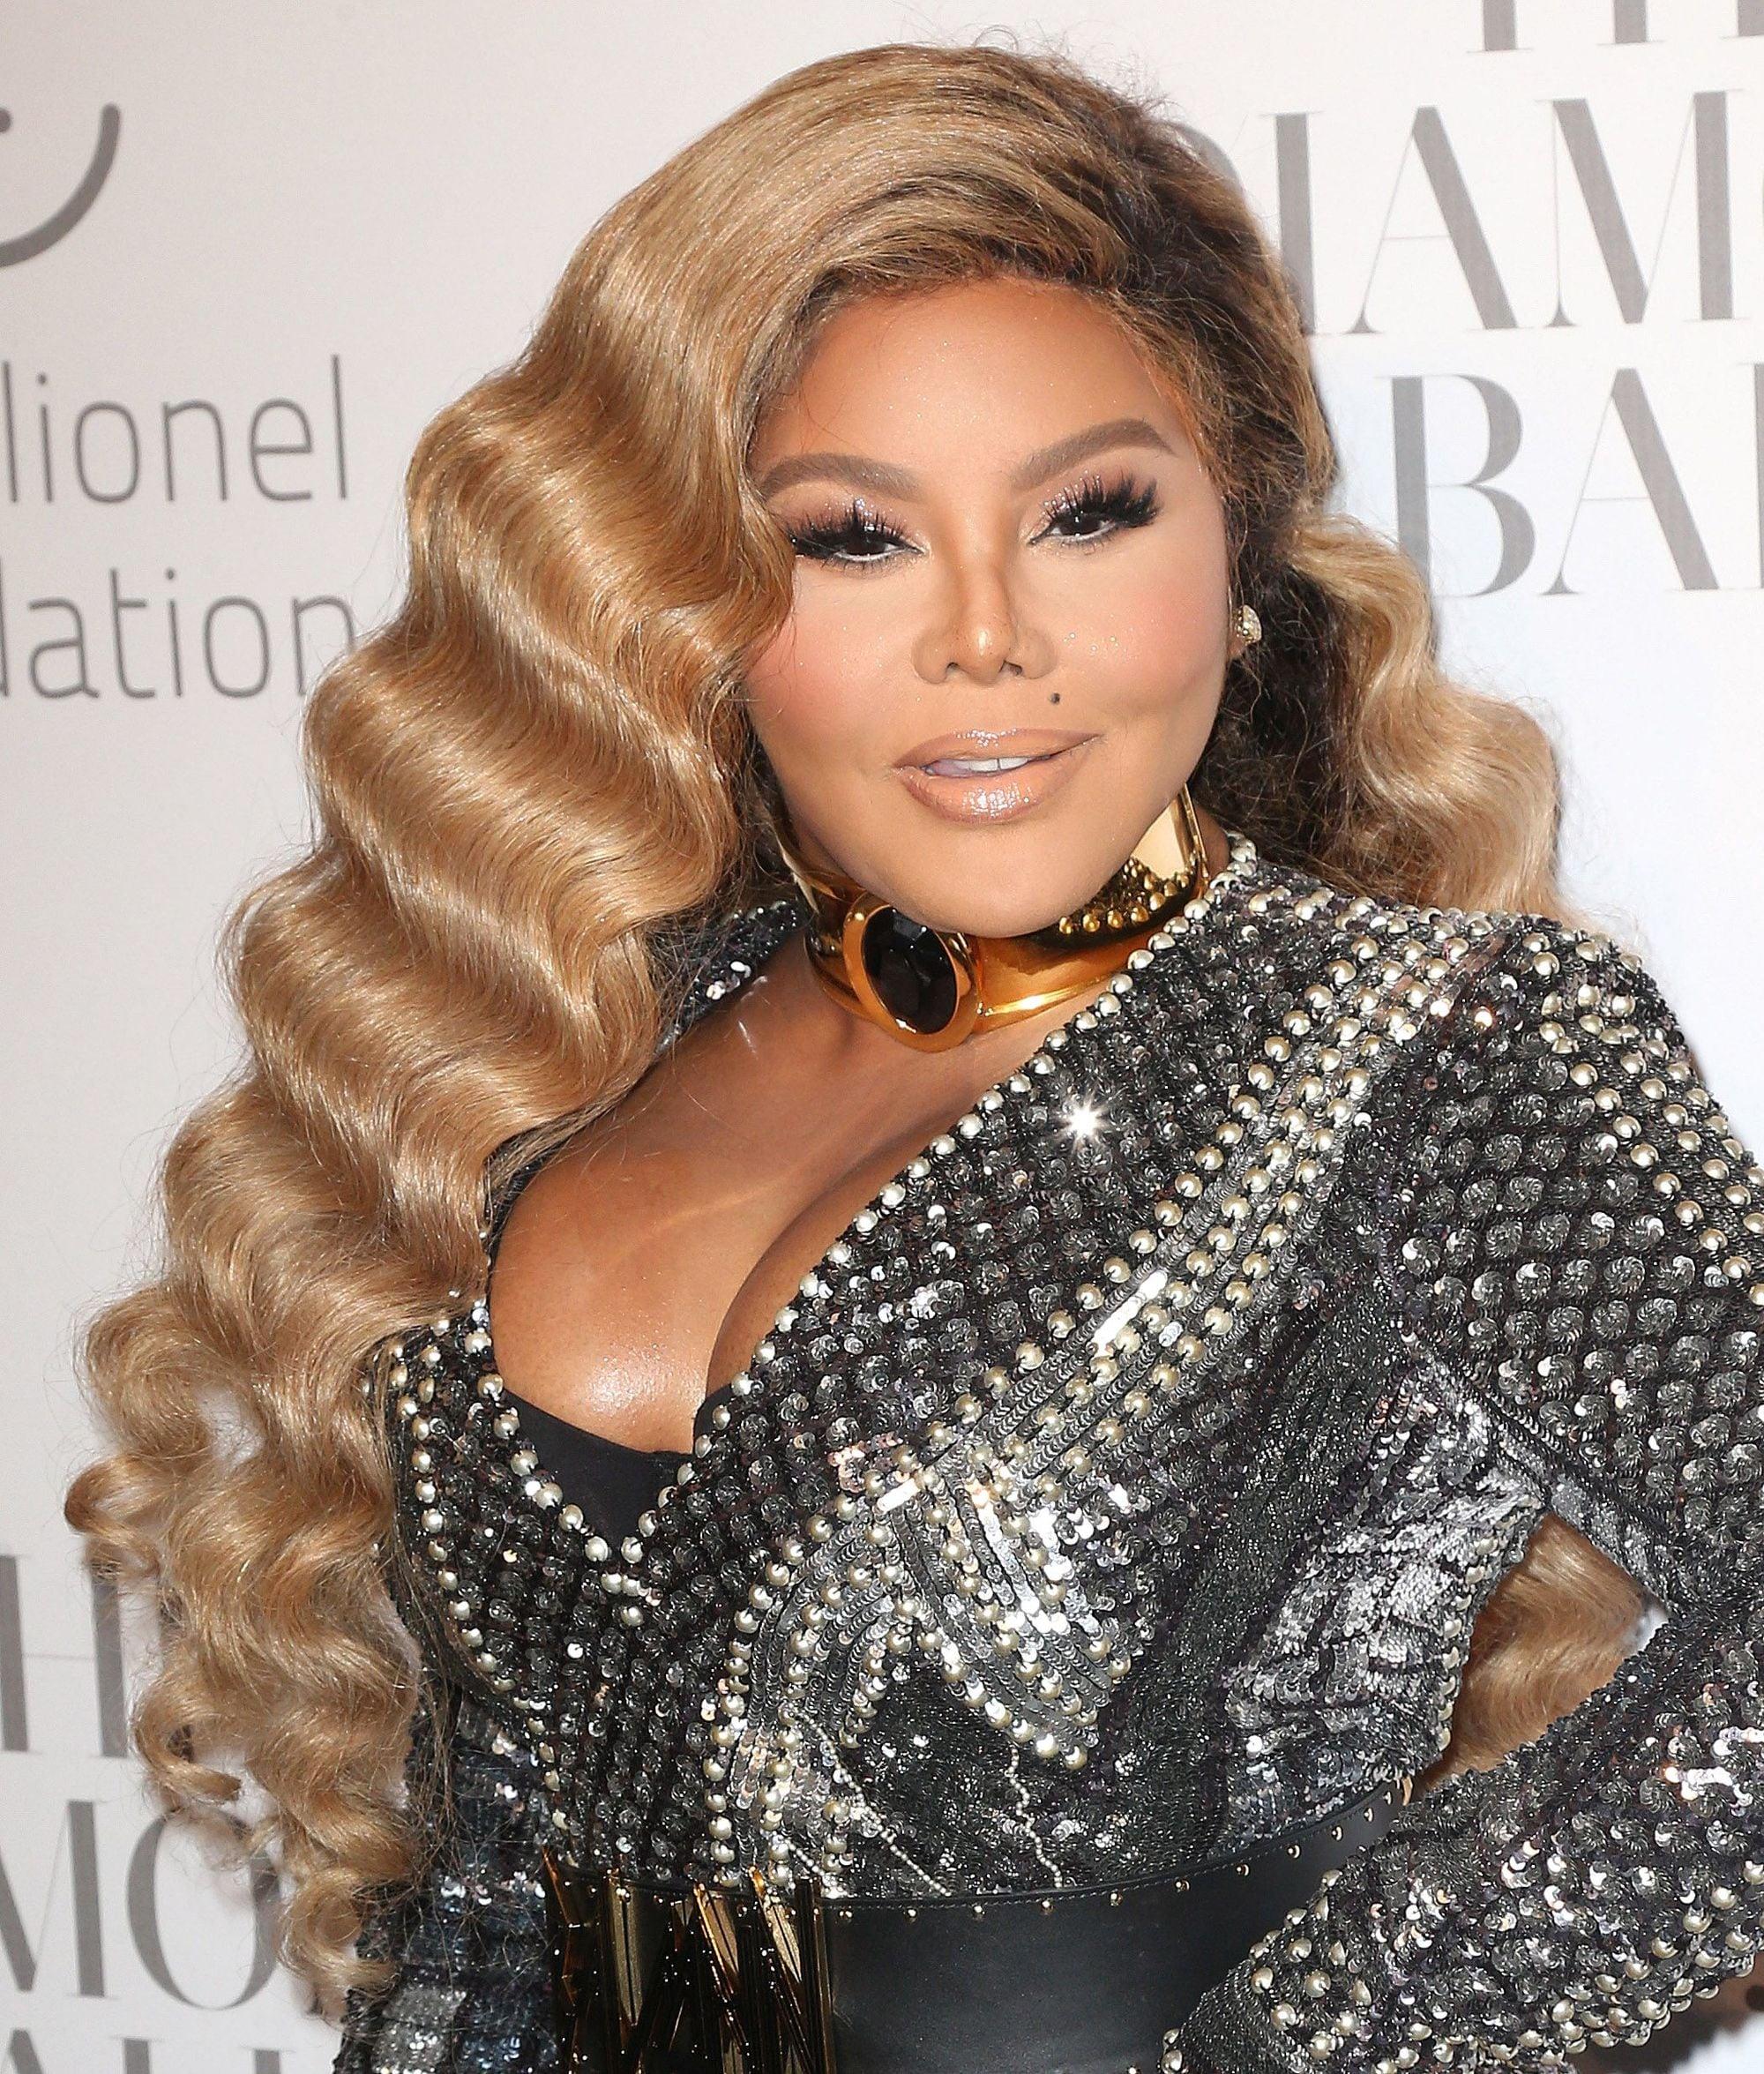 Lil Kim with golden honey long wavy hair